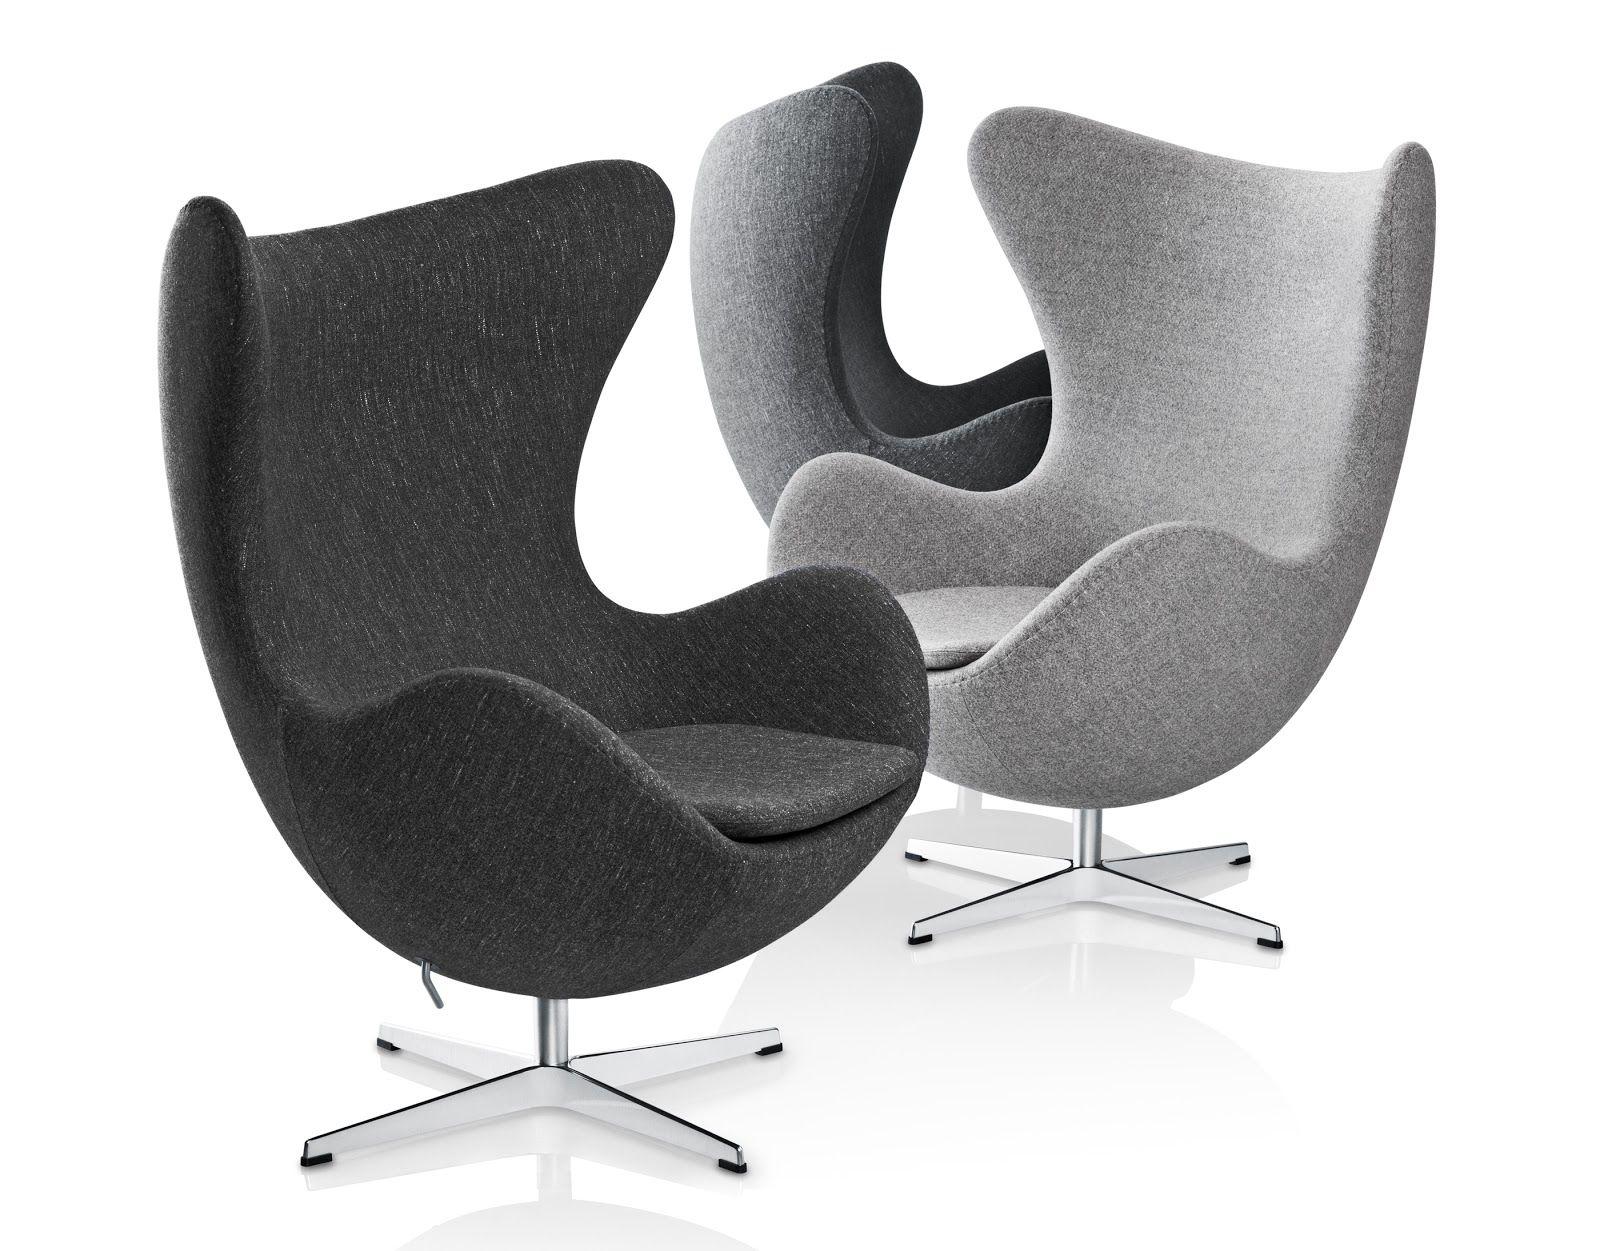 Arne Jacobsen Egg Chair 1958 Egg chair, Arne jacobsen